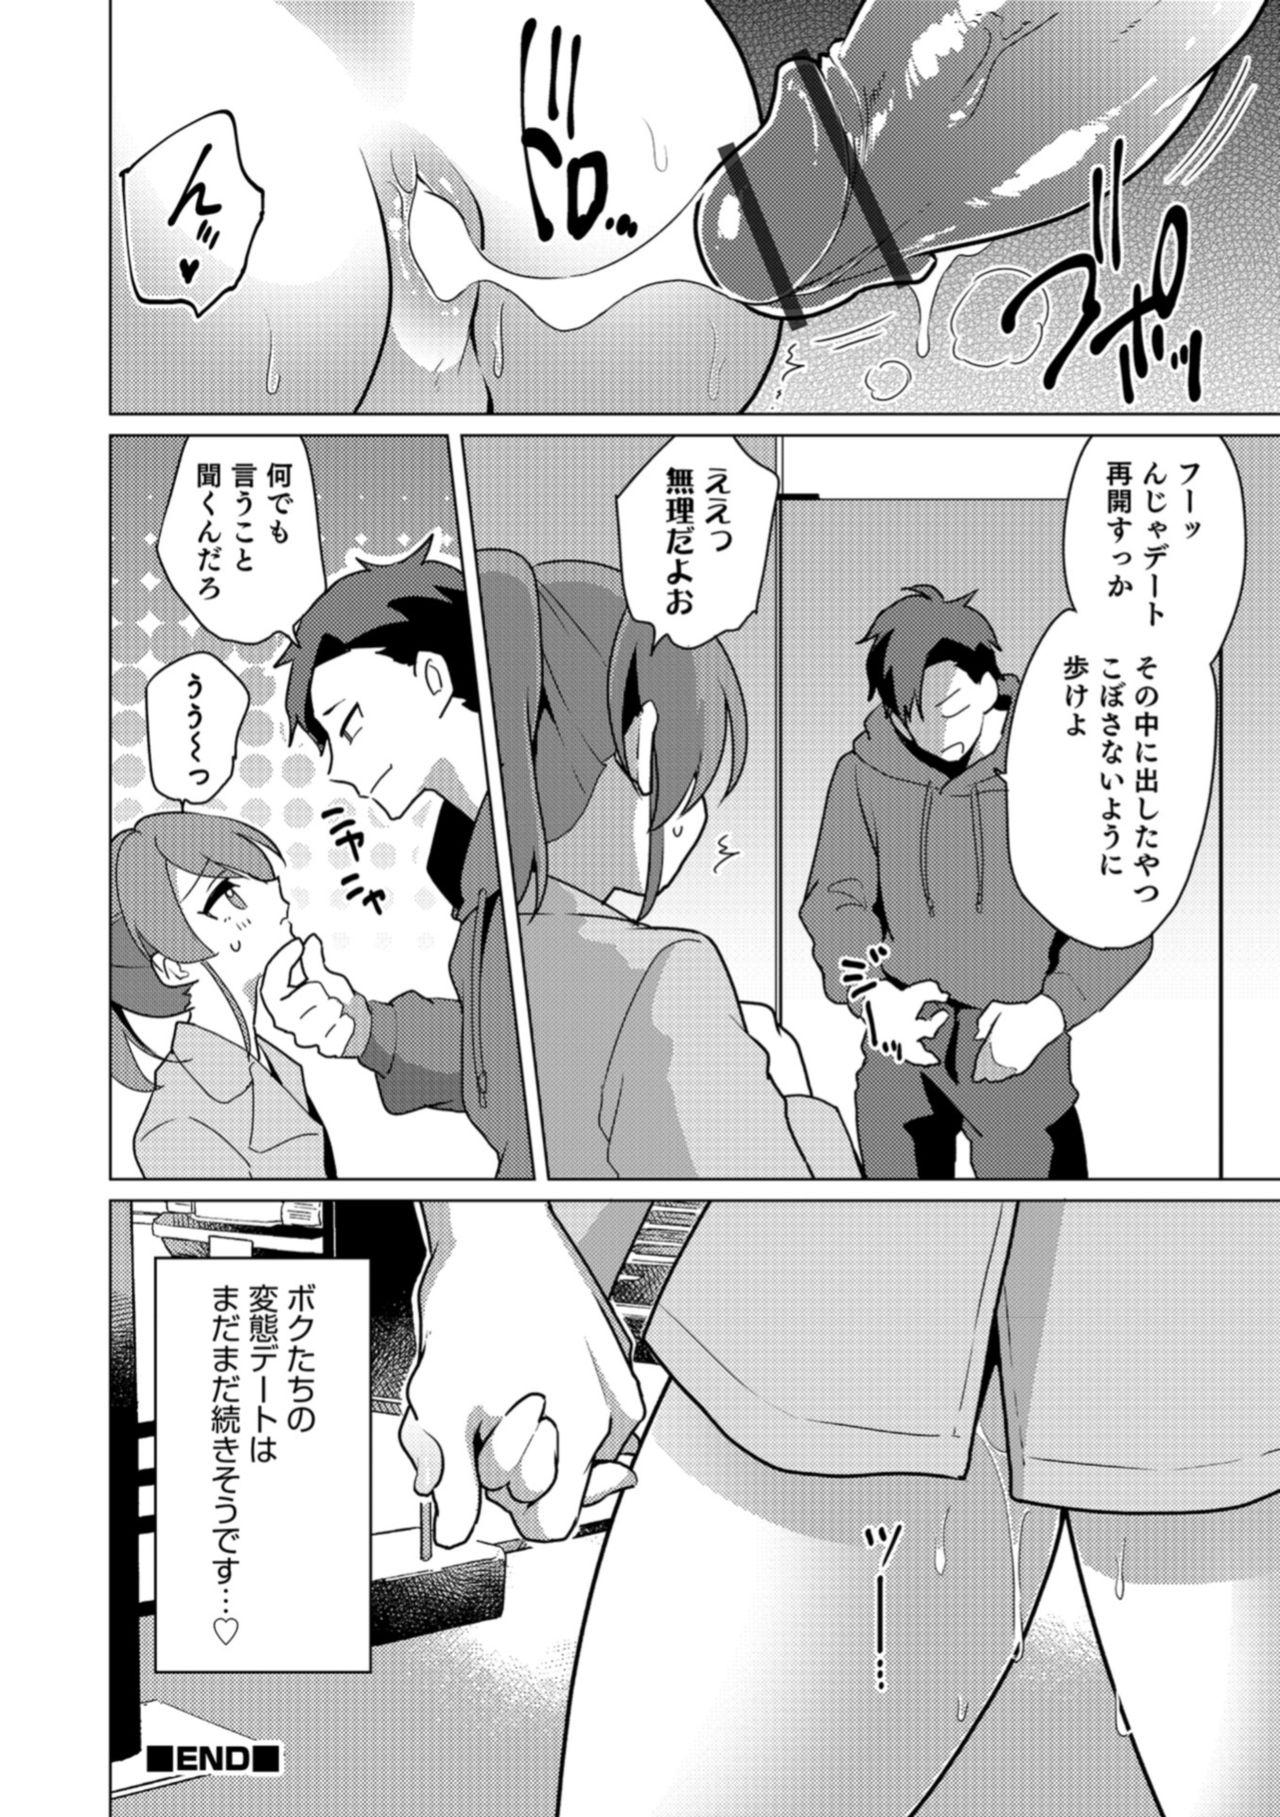 Otokonoko HELL'S GATE #03 133